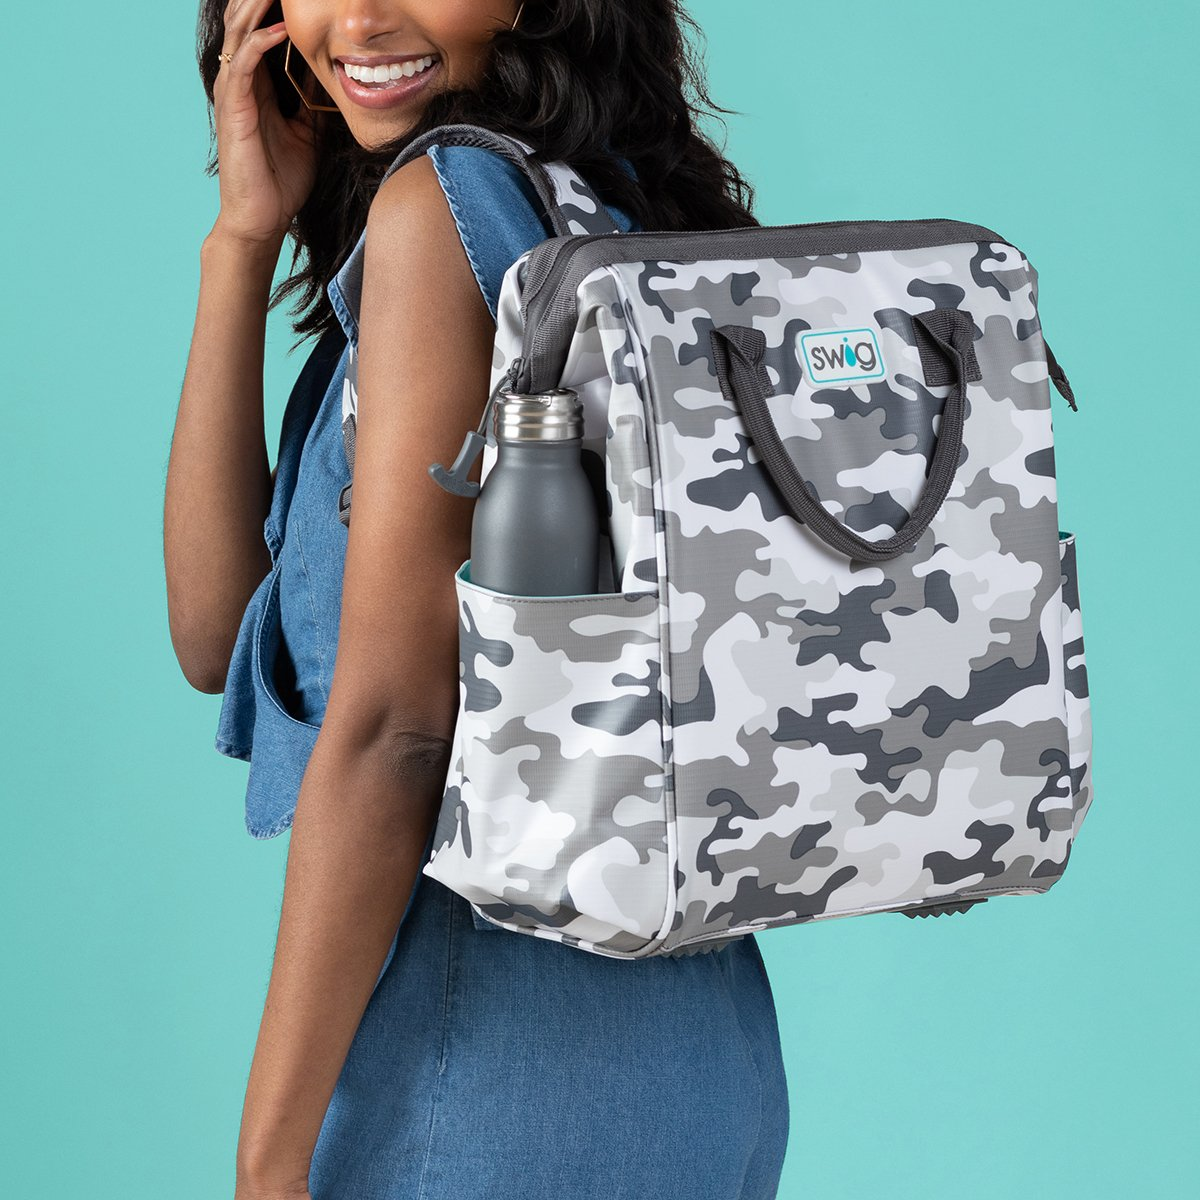 Camo Swig Backpack Cooler